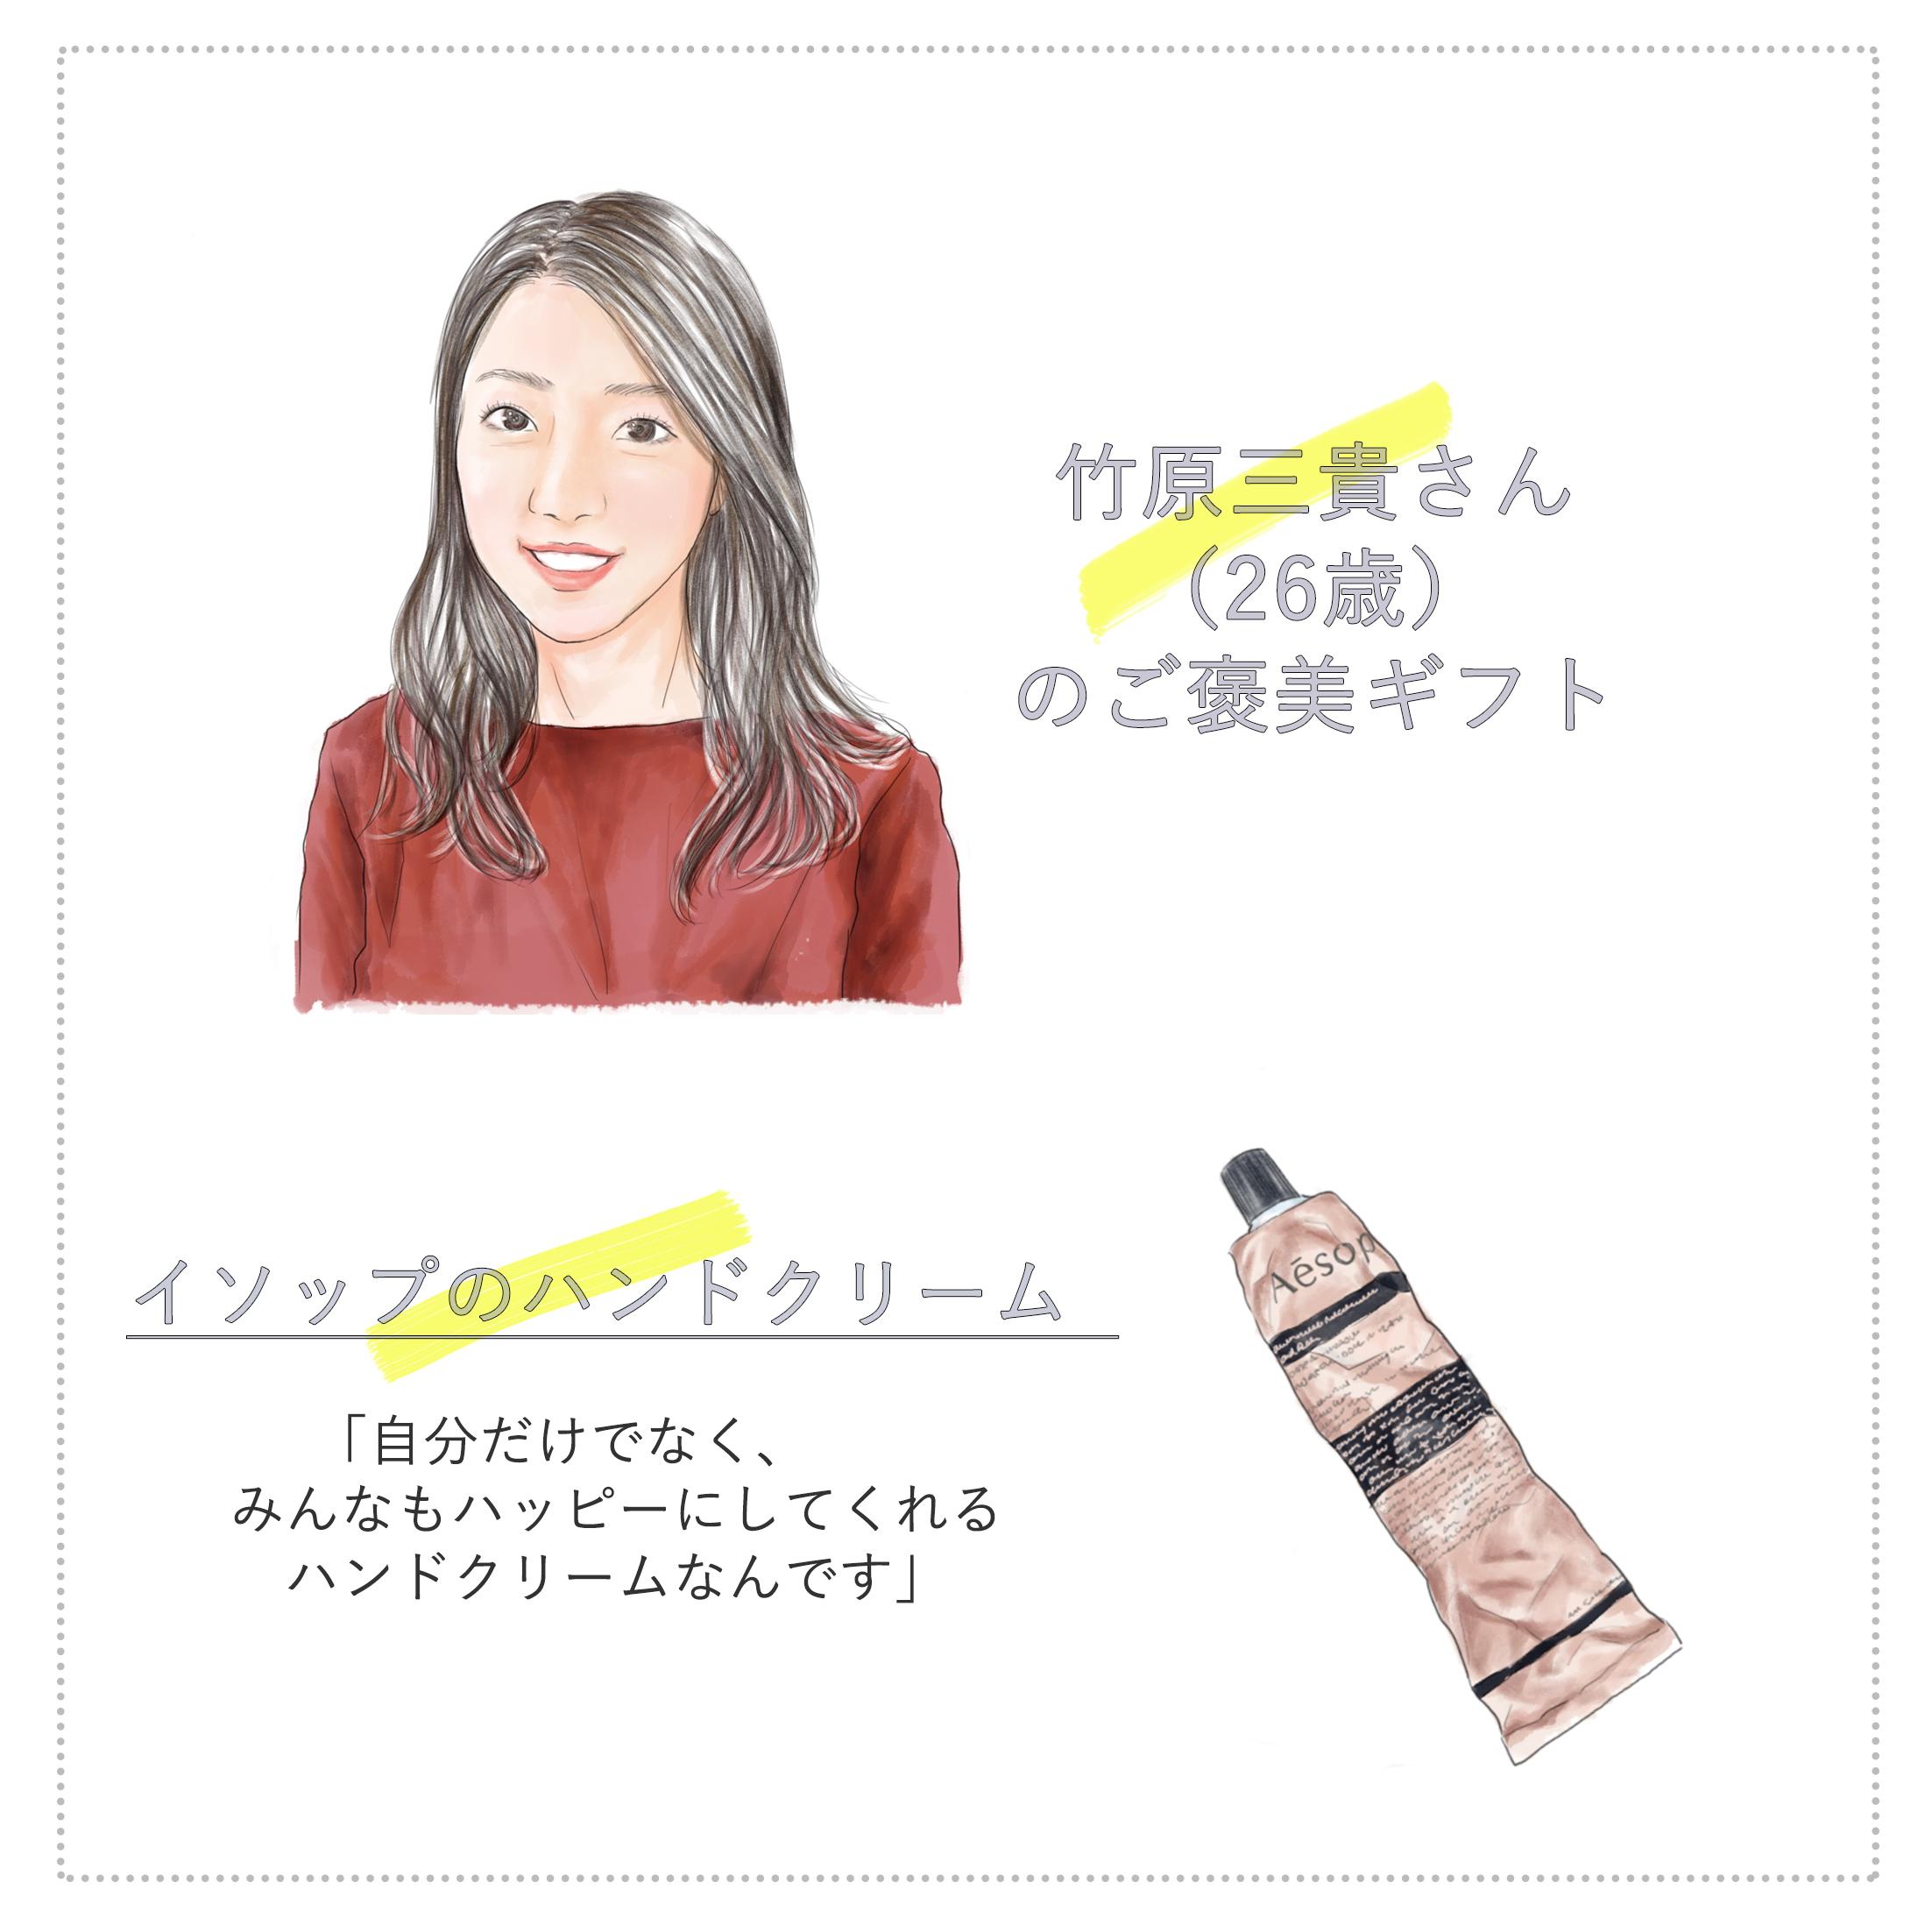 「Schoo人事学びゼミ」のコミュニティマネージャー兼法人営業をされている竹原三貴さん(26歳)